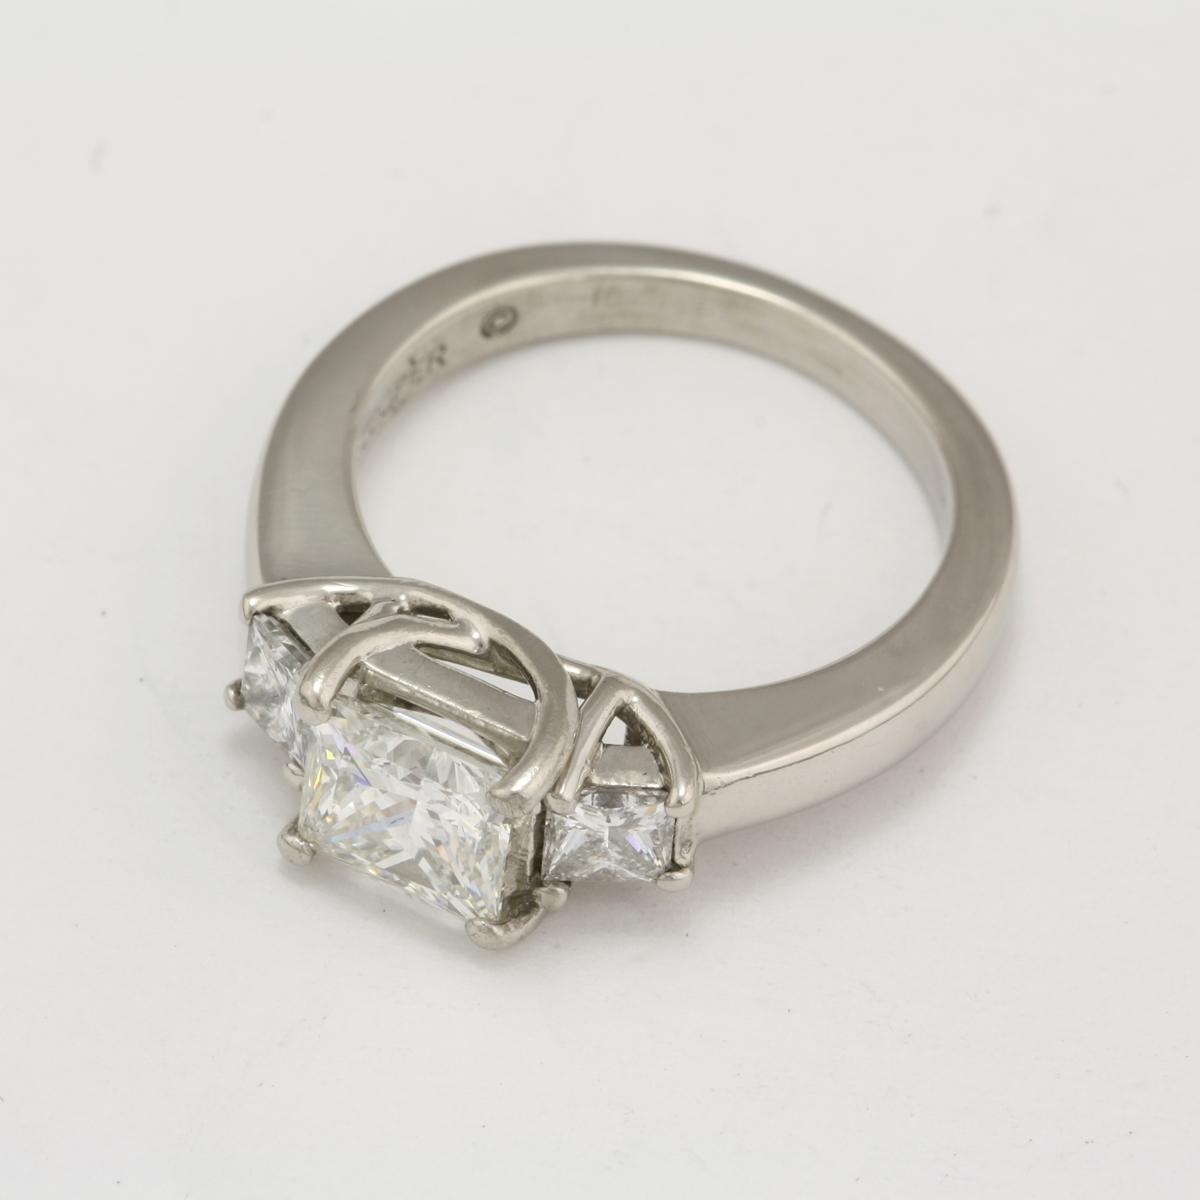 Preowned Platinum 3stone Diamond Engagement Ring